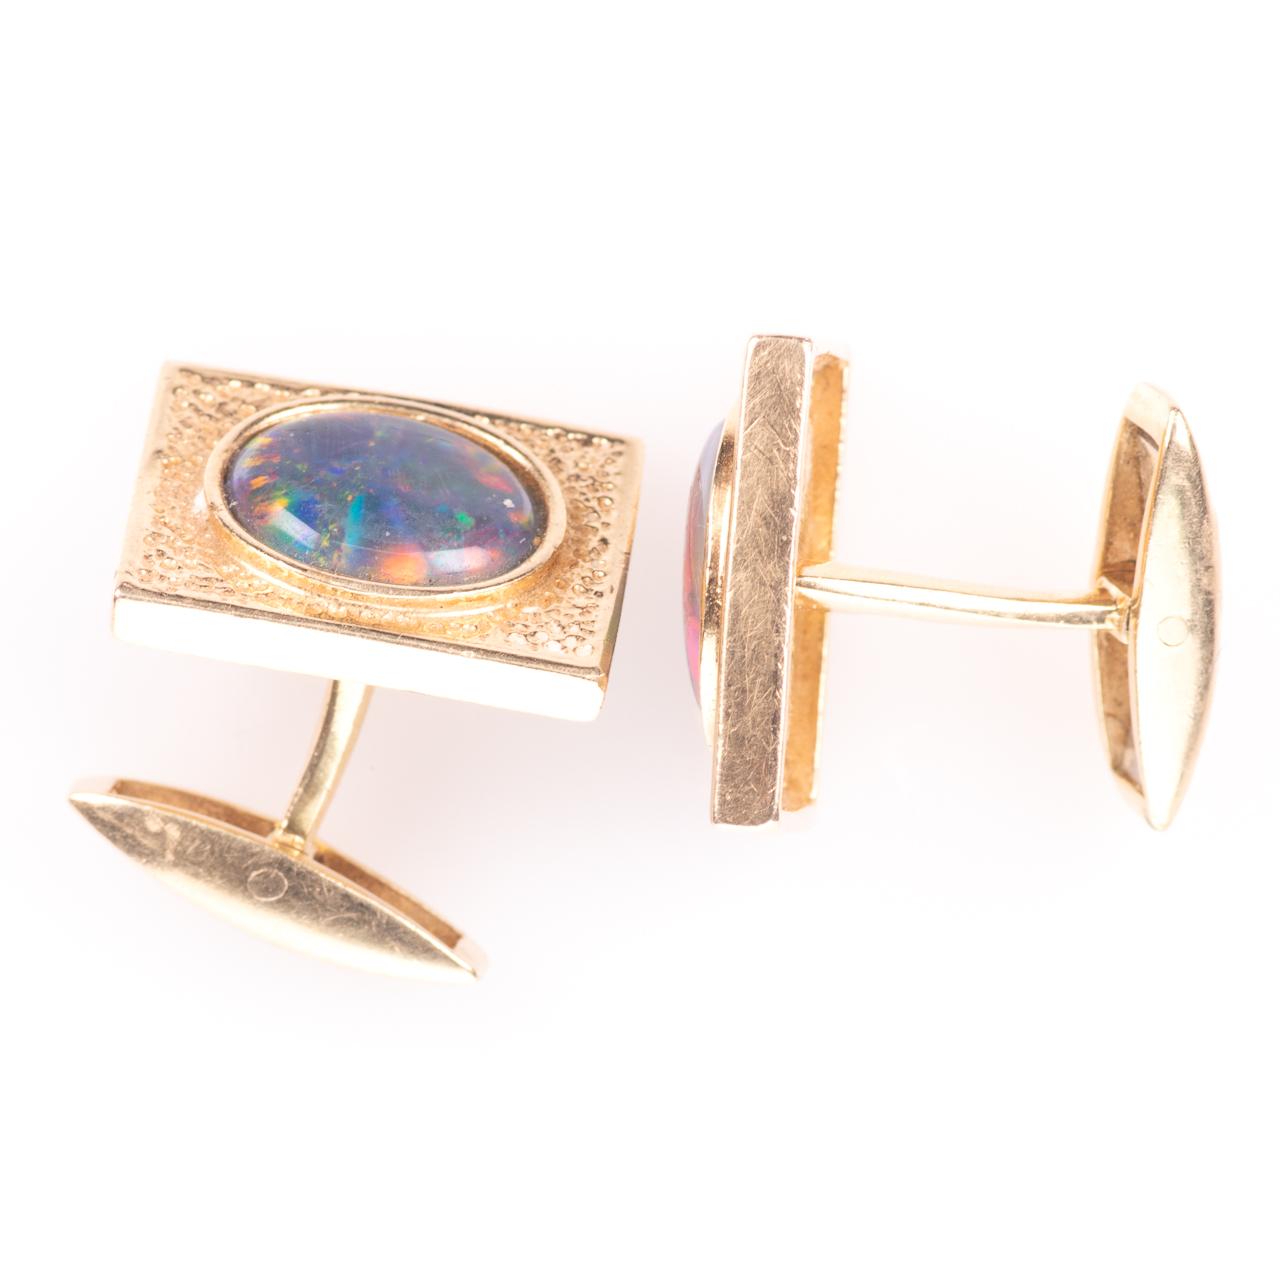 14ct Gold Gentleman's Black Lightning Opal Cufflinks - Image 5 of 6